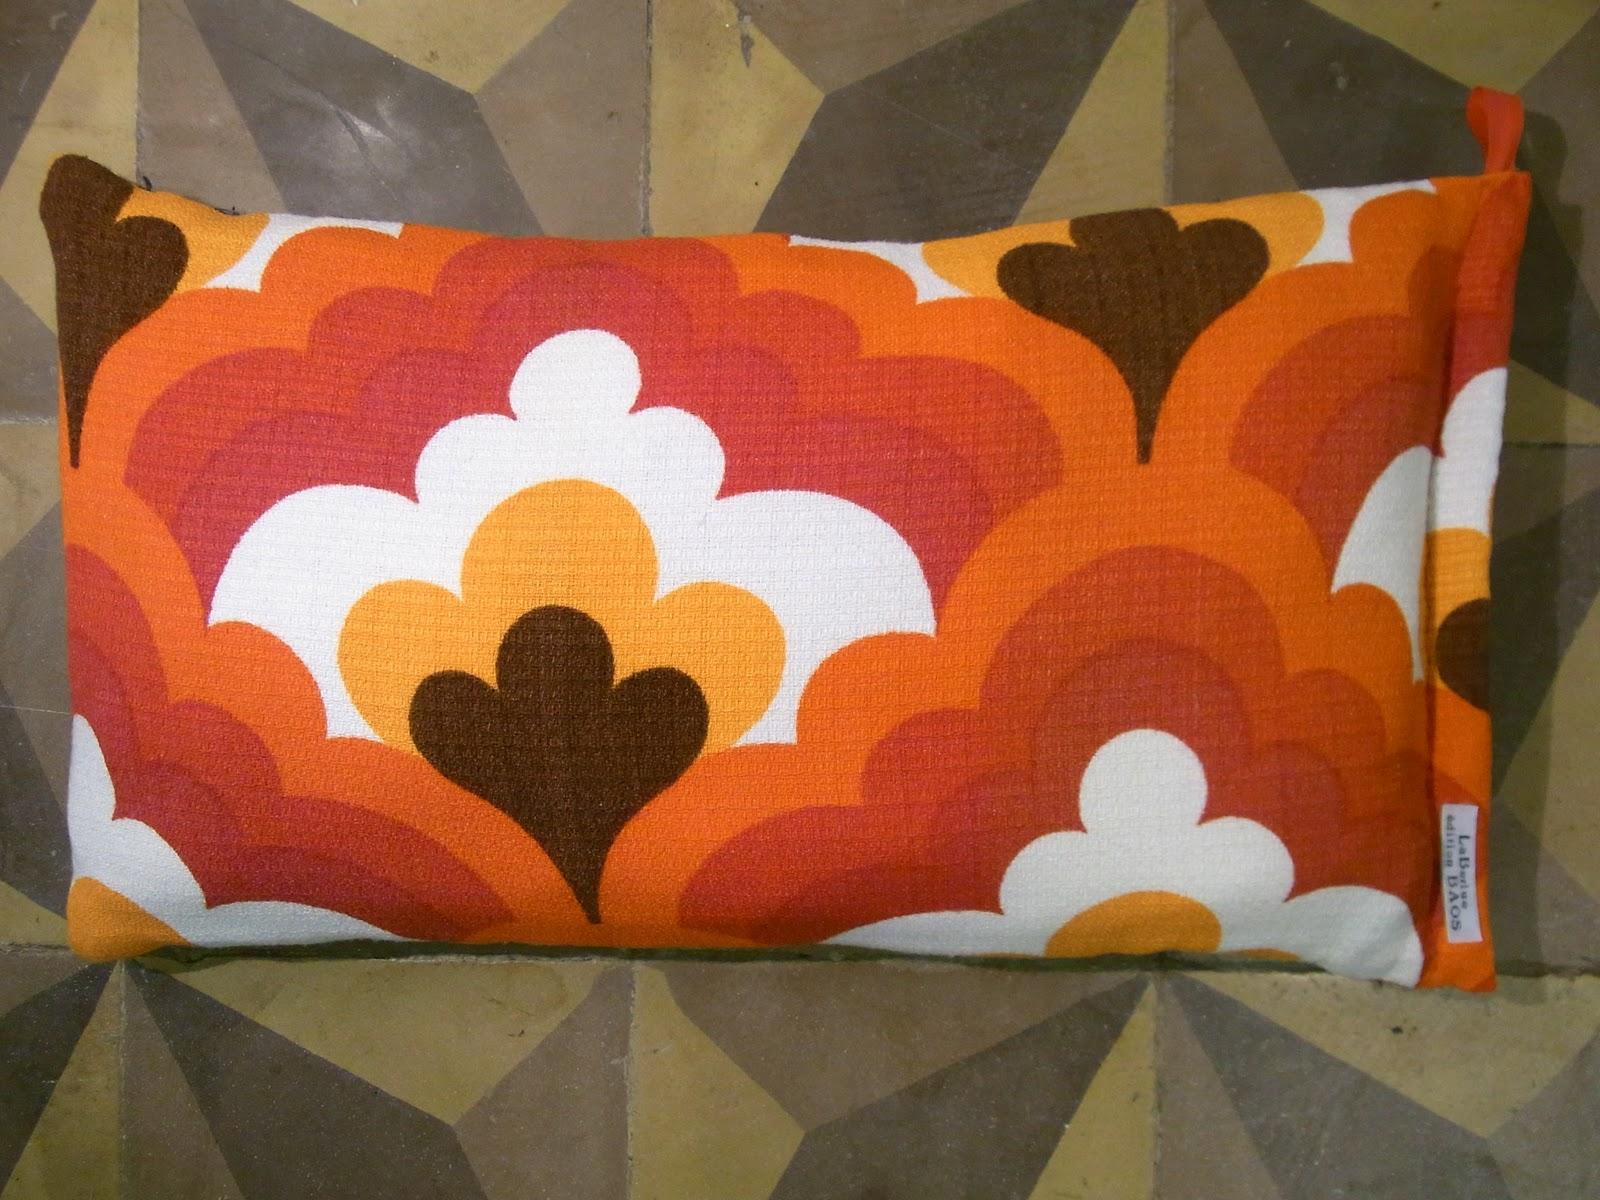 baos coussins 35 x 35 cm tissu motifs vintage 50 39 cr ation laberlue dition baos. Black Bedroom Furniture Sets. Home Design Ideas